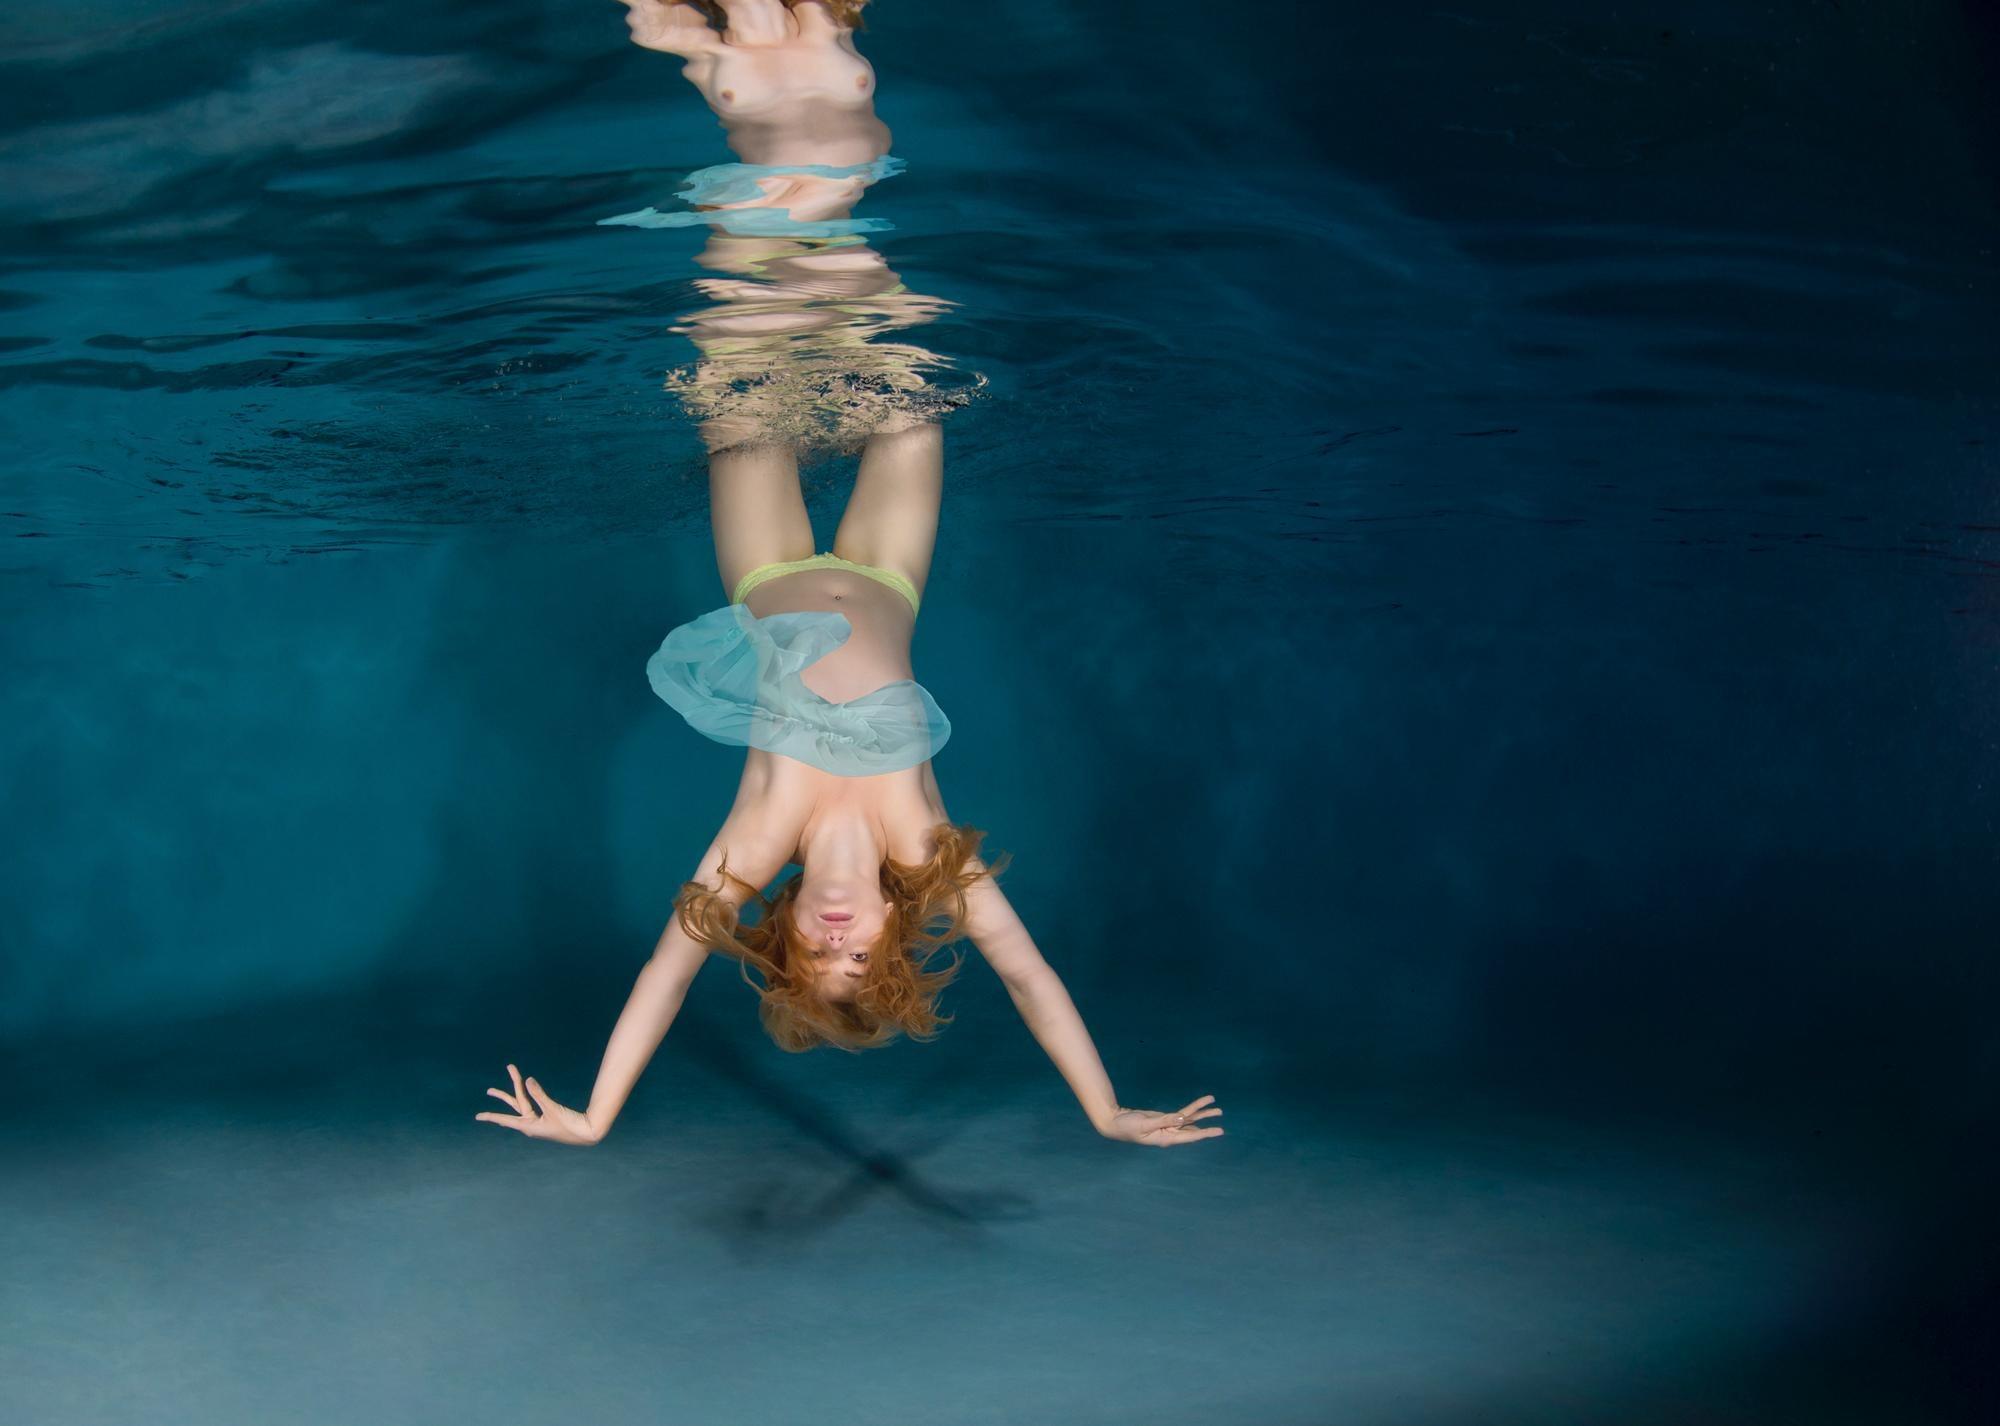 Circus - underwater photograph - print on aluminum